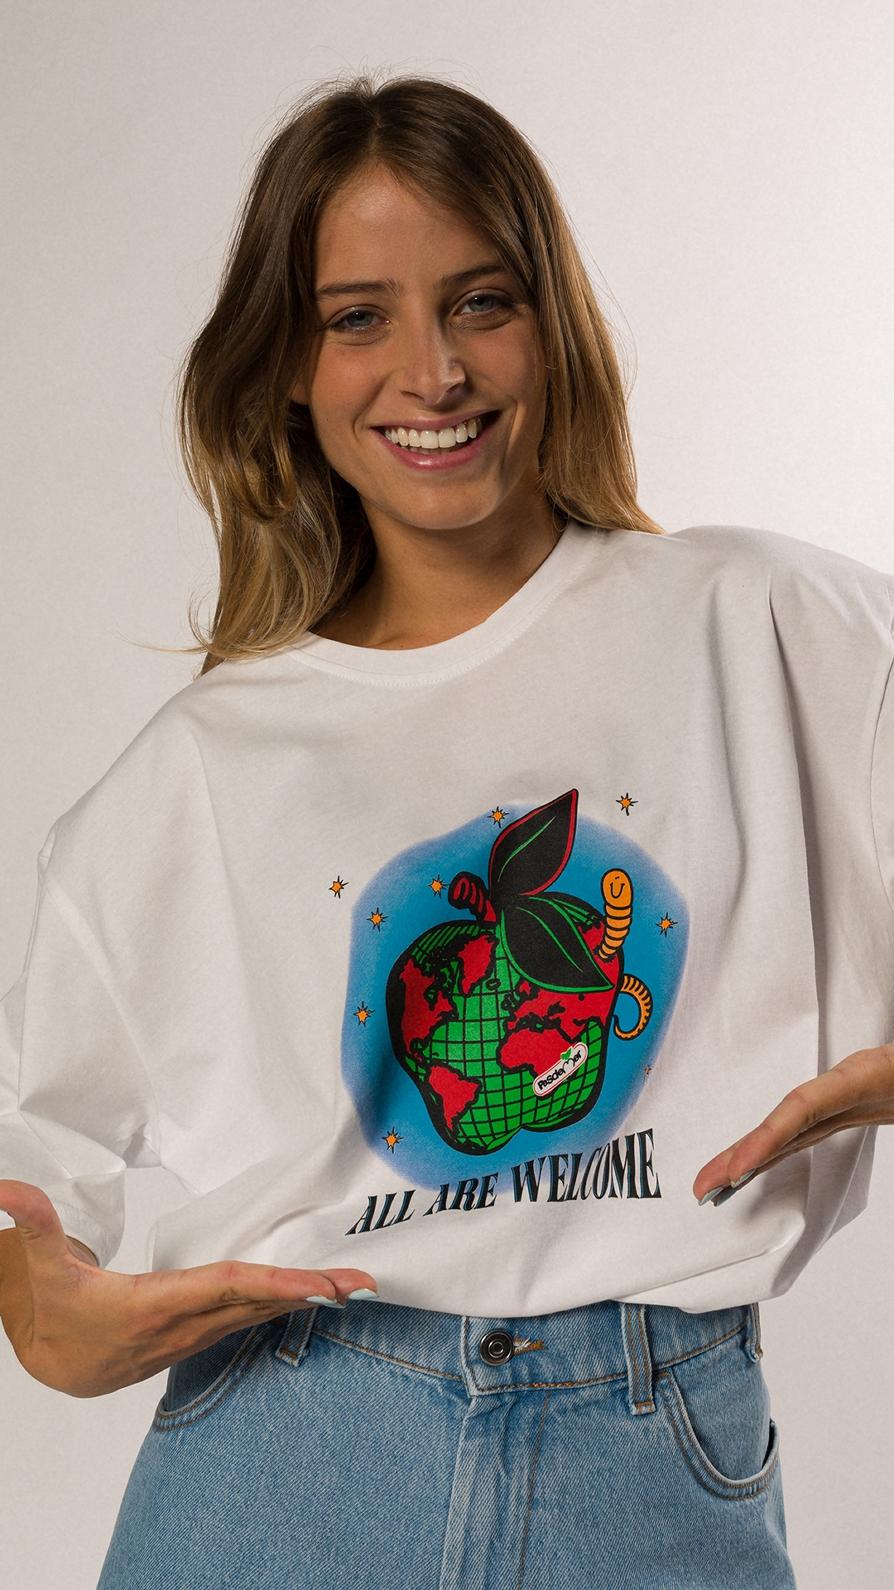 【PAS DE MER/パドゥメ】WELCOME T-SHIRT Tシャツ / WHITE